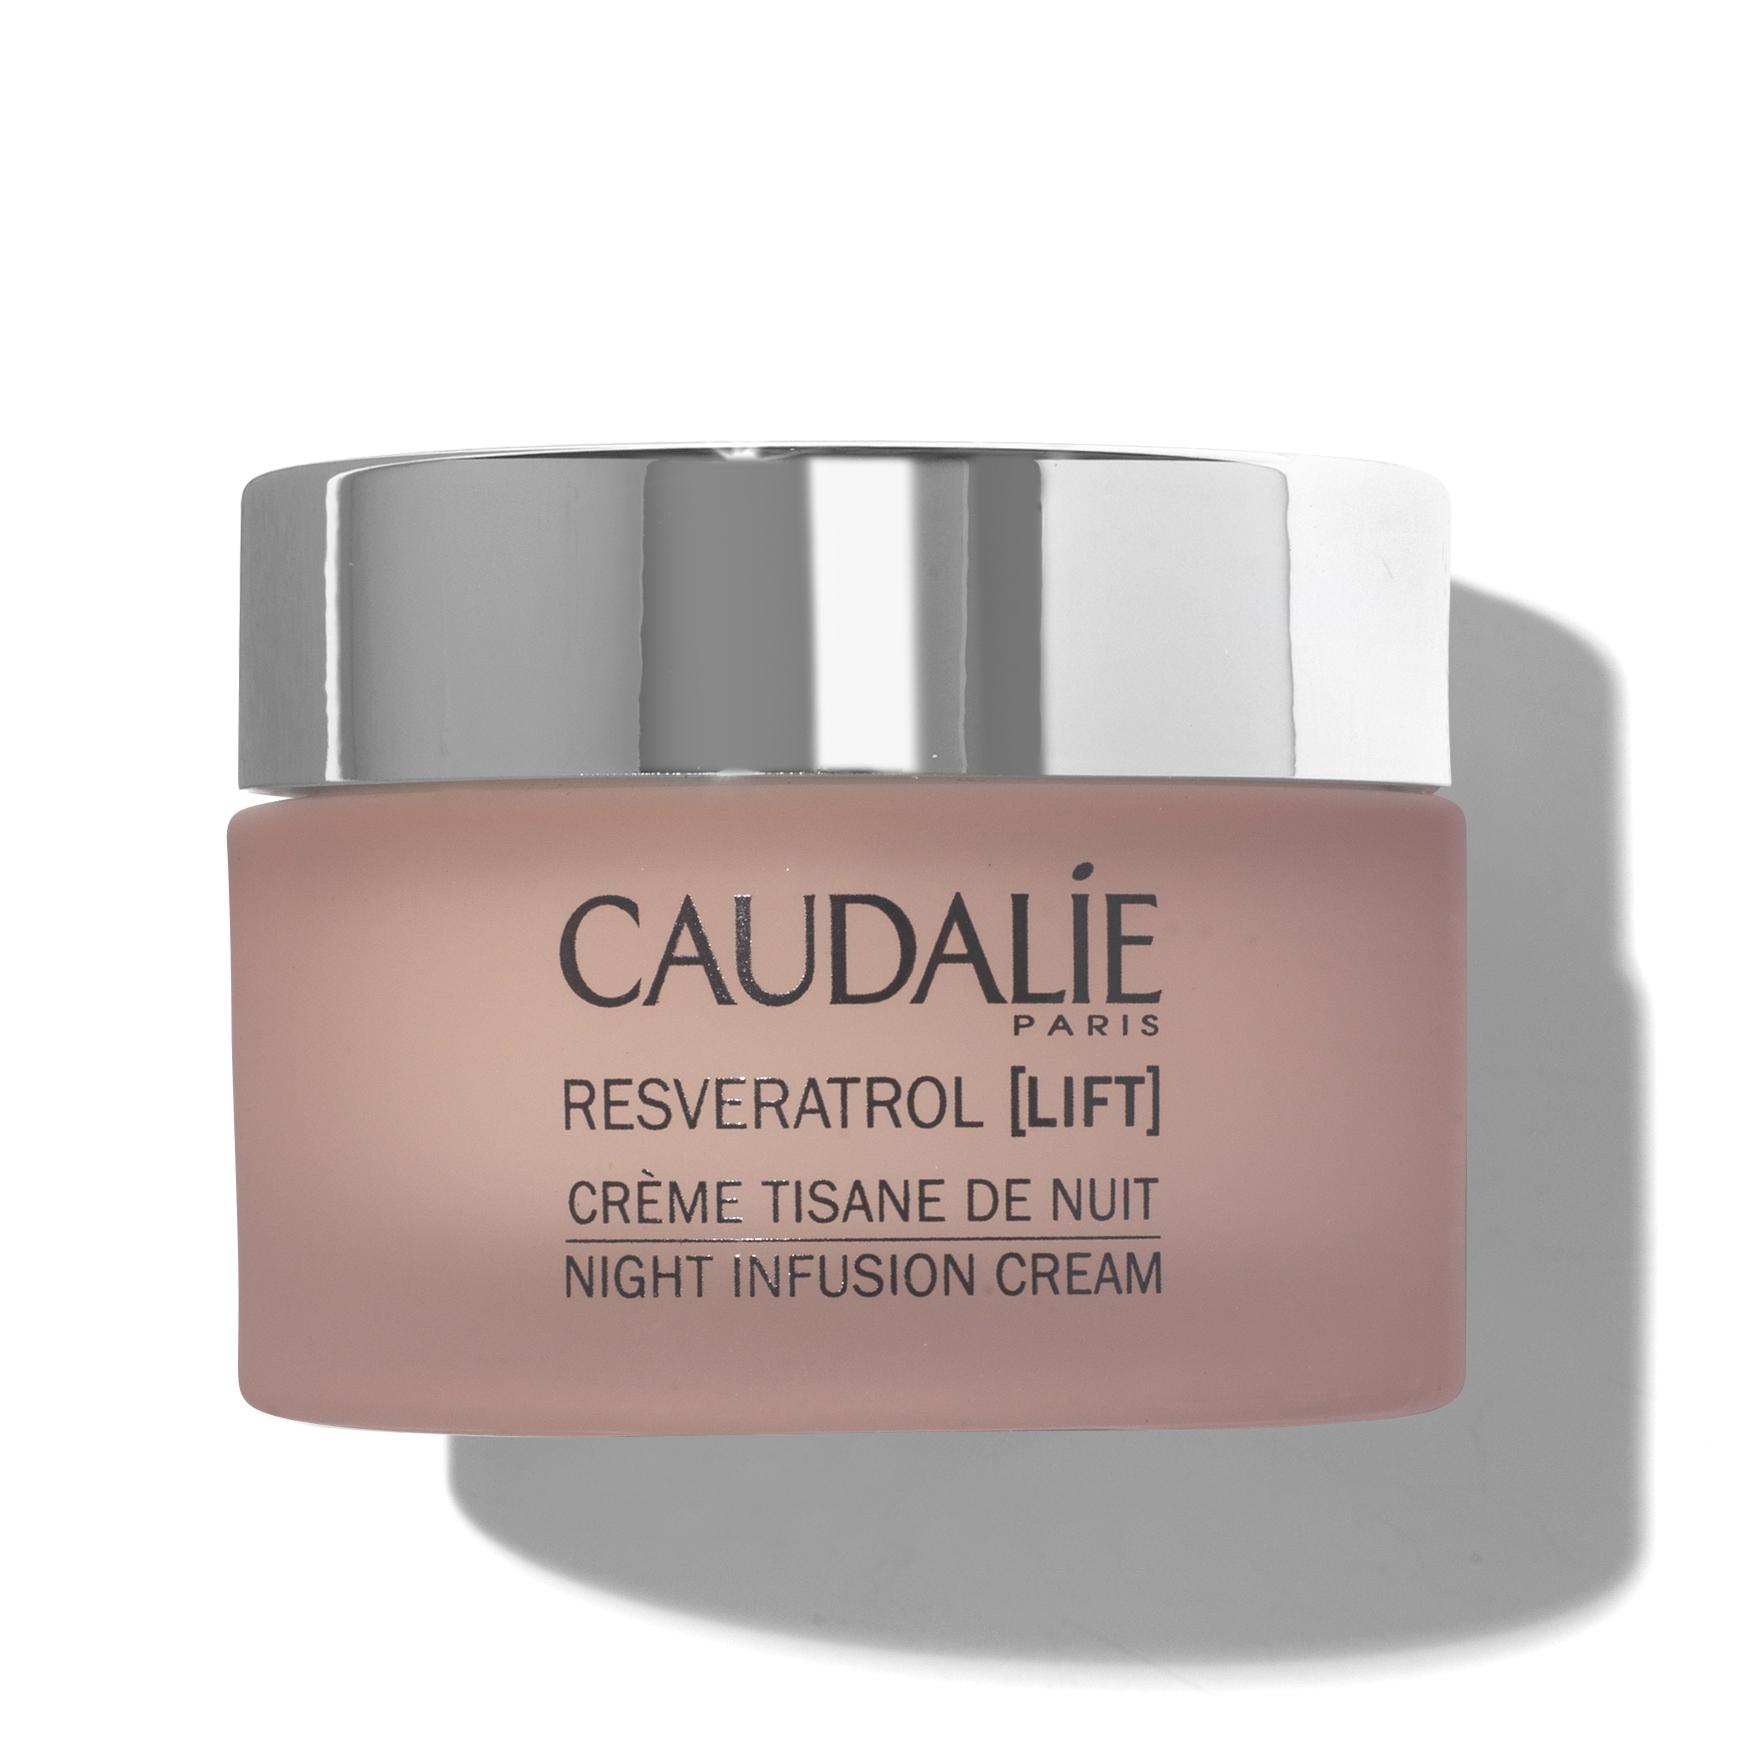 Resvératrol Lift Night Infusion Cream, , large